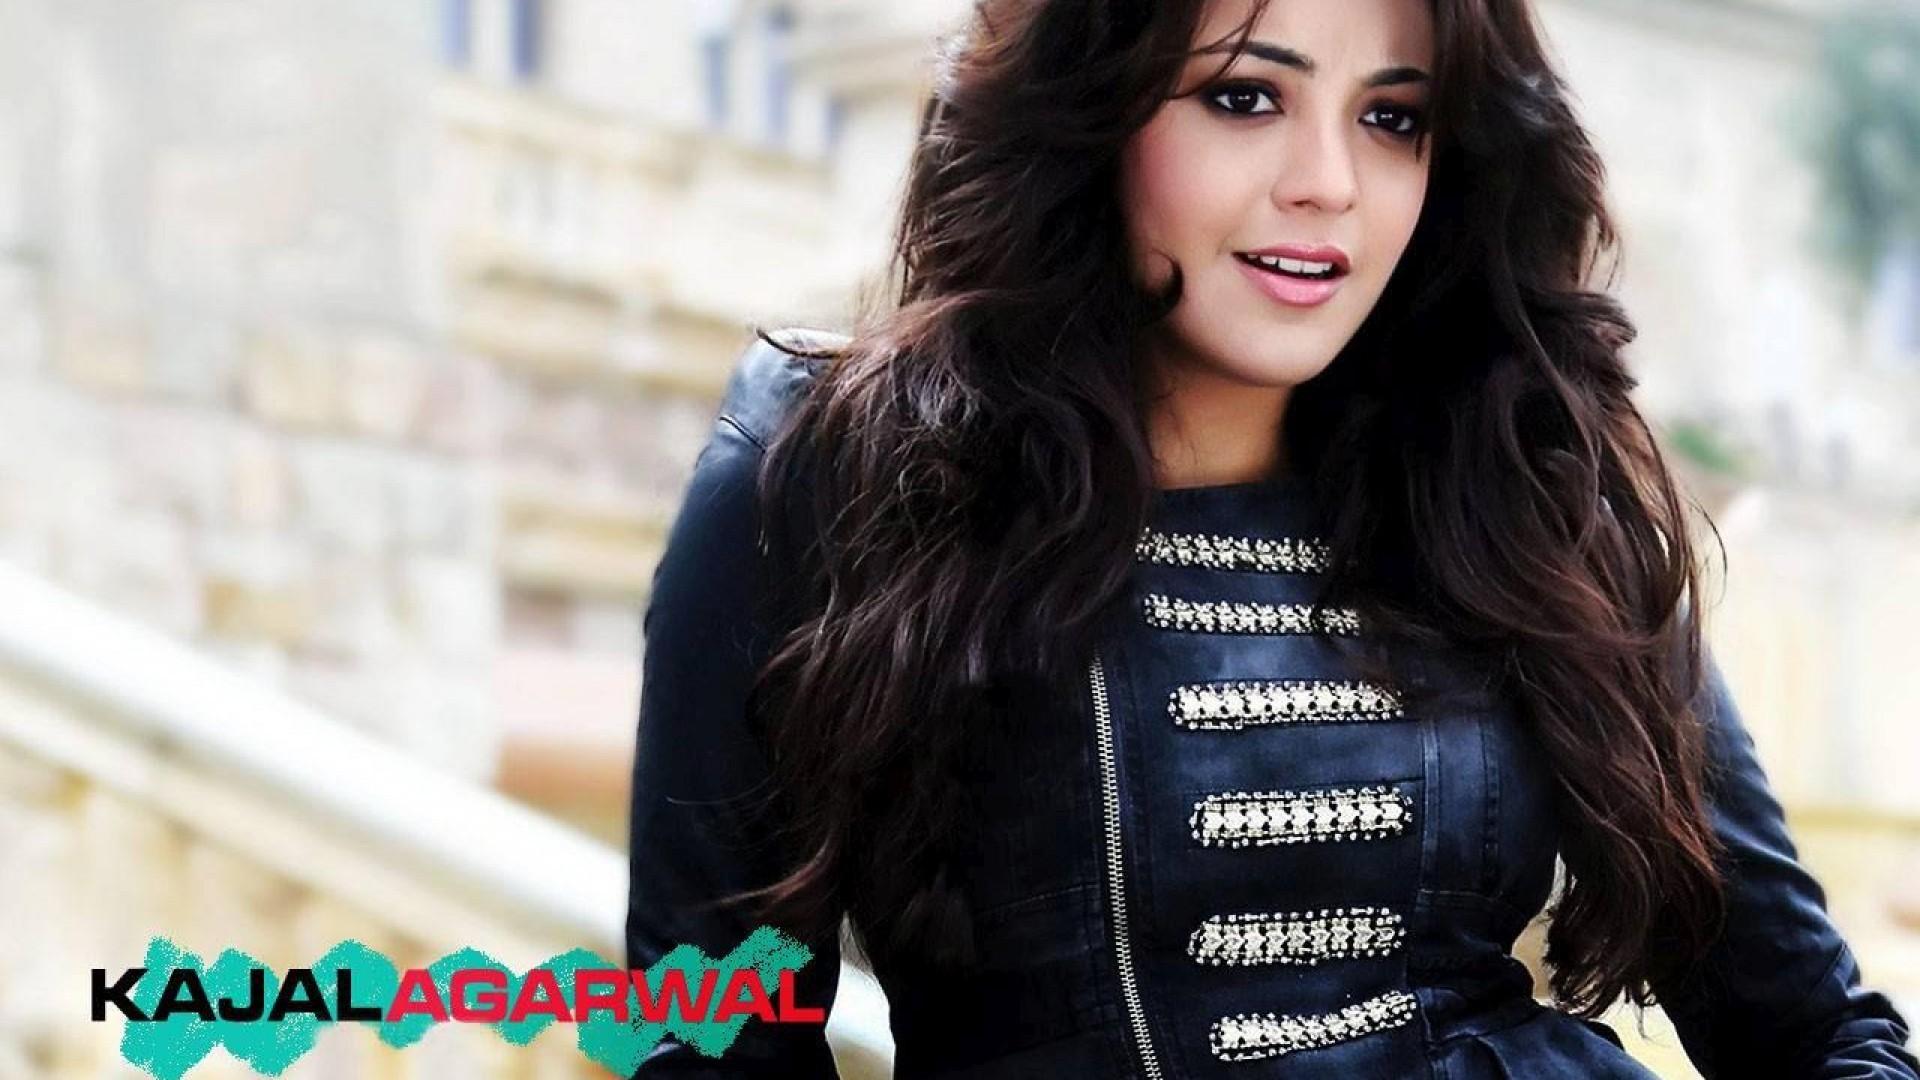 Bollywood Actress Hd Wallpapers Hollywood Actress Hd: Latest Bollywood Actress Wallpapers 2018 HD (74+ Images